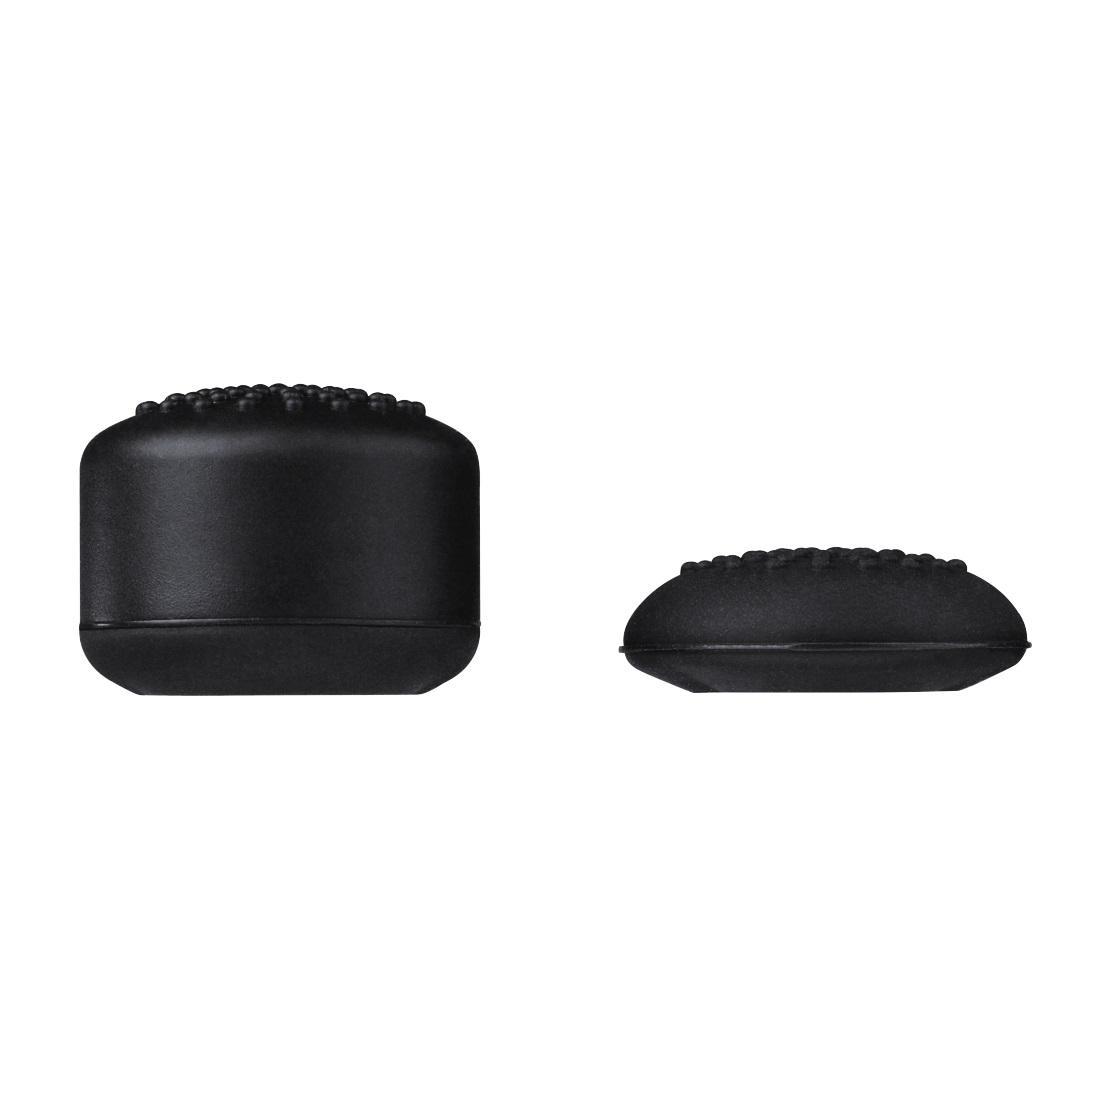 Сменяеми бутончета HAMA 54475 за SONY PS4 комплект 8in1, Черен